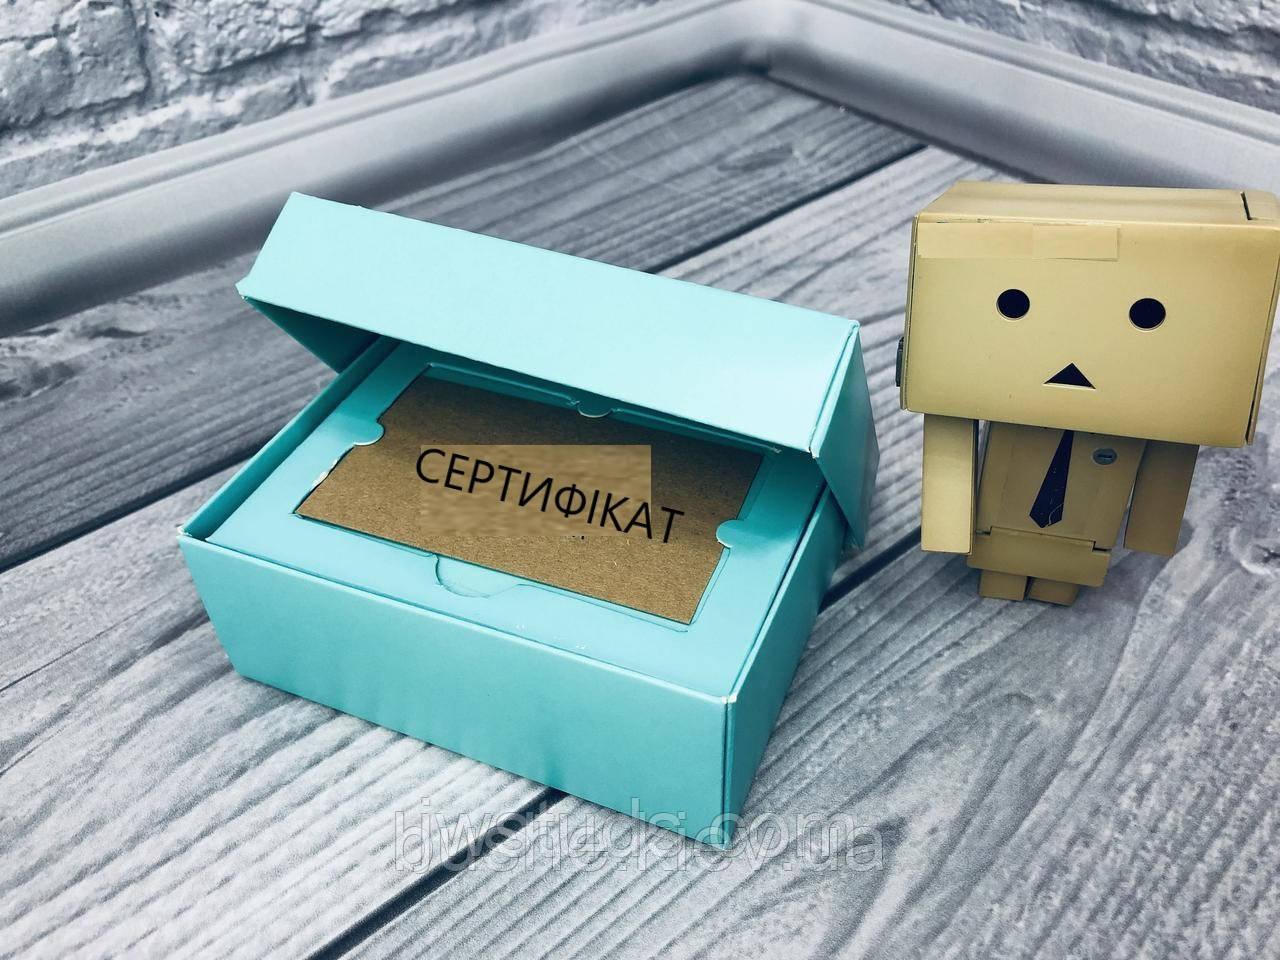 Подарочная Коробка для пластиковой карты сертификата  / 140х85х45 мм / Цвет: Бирюза